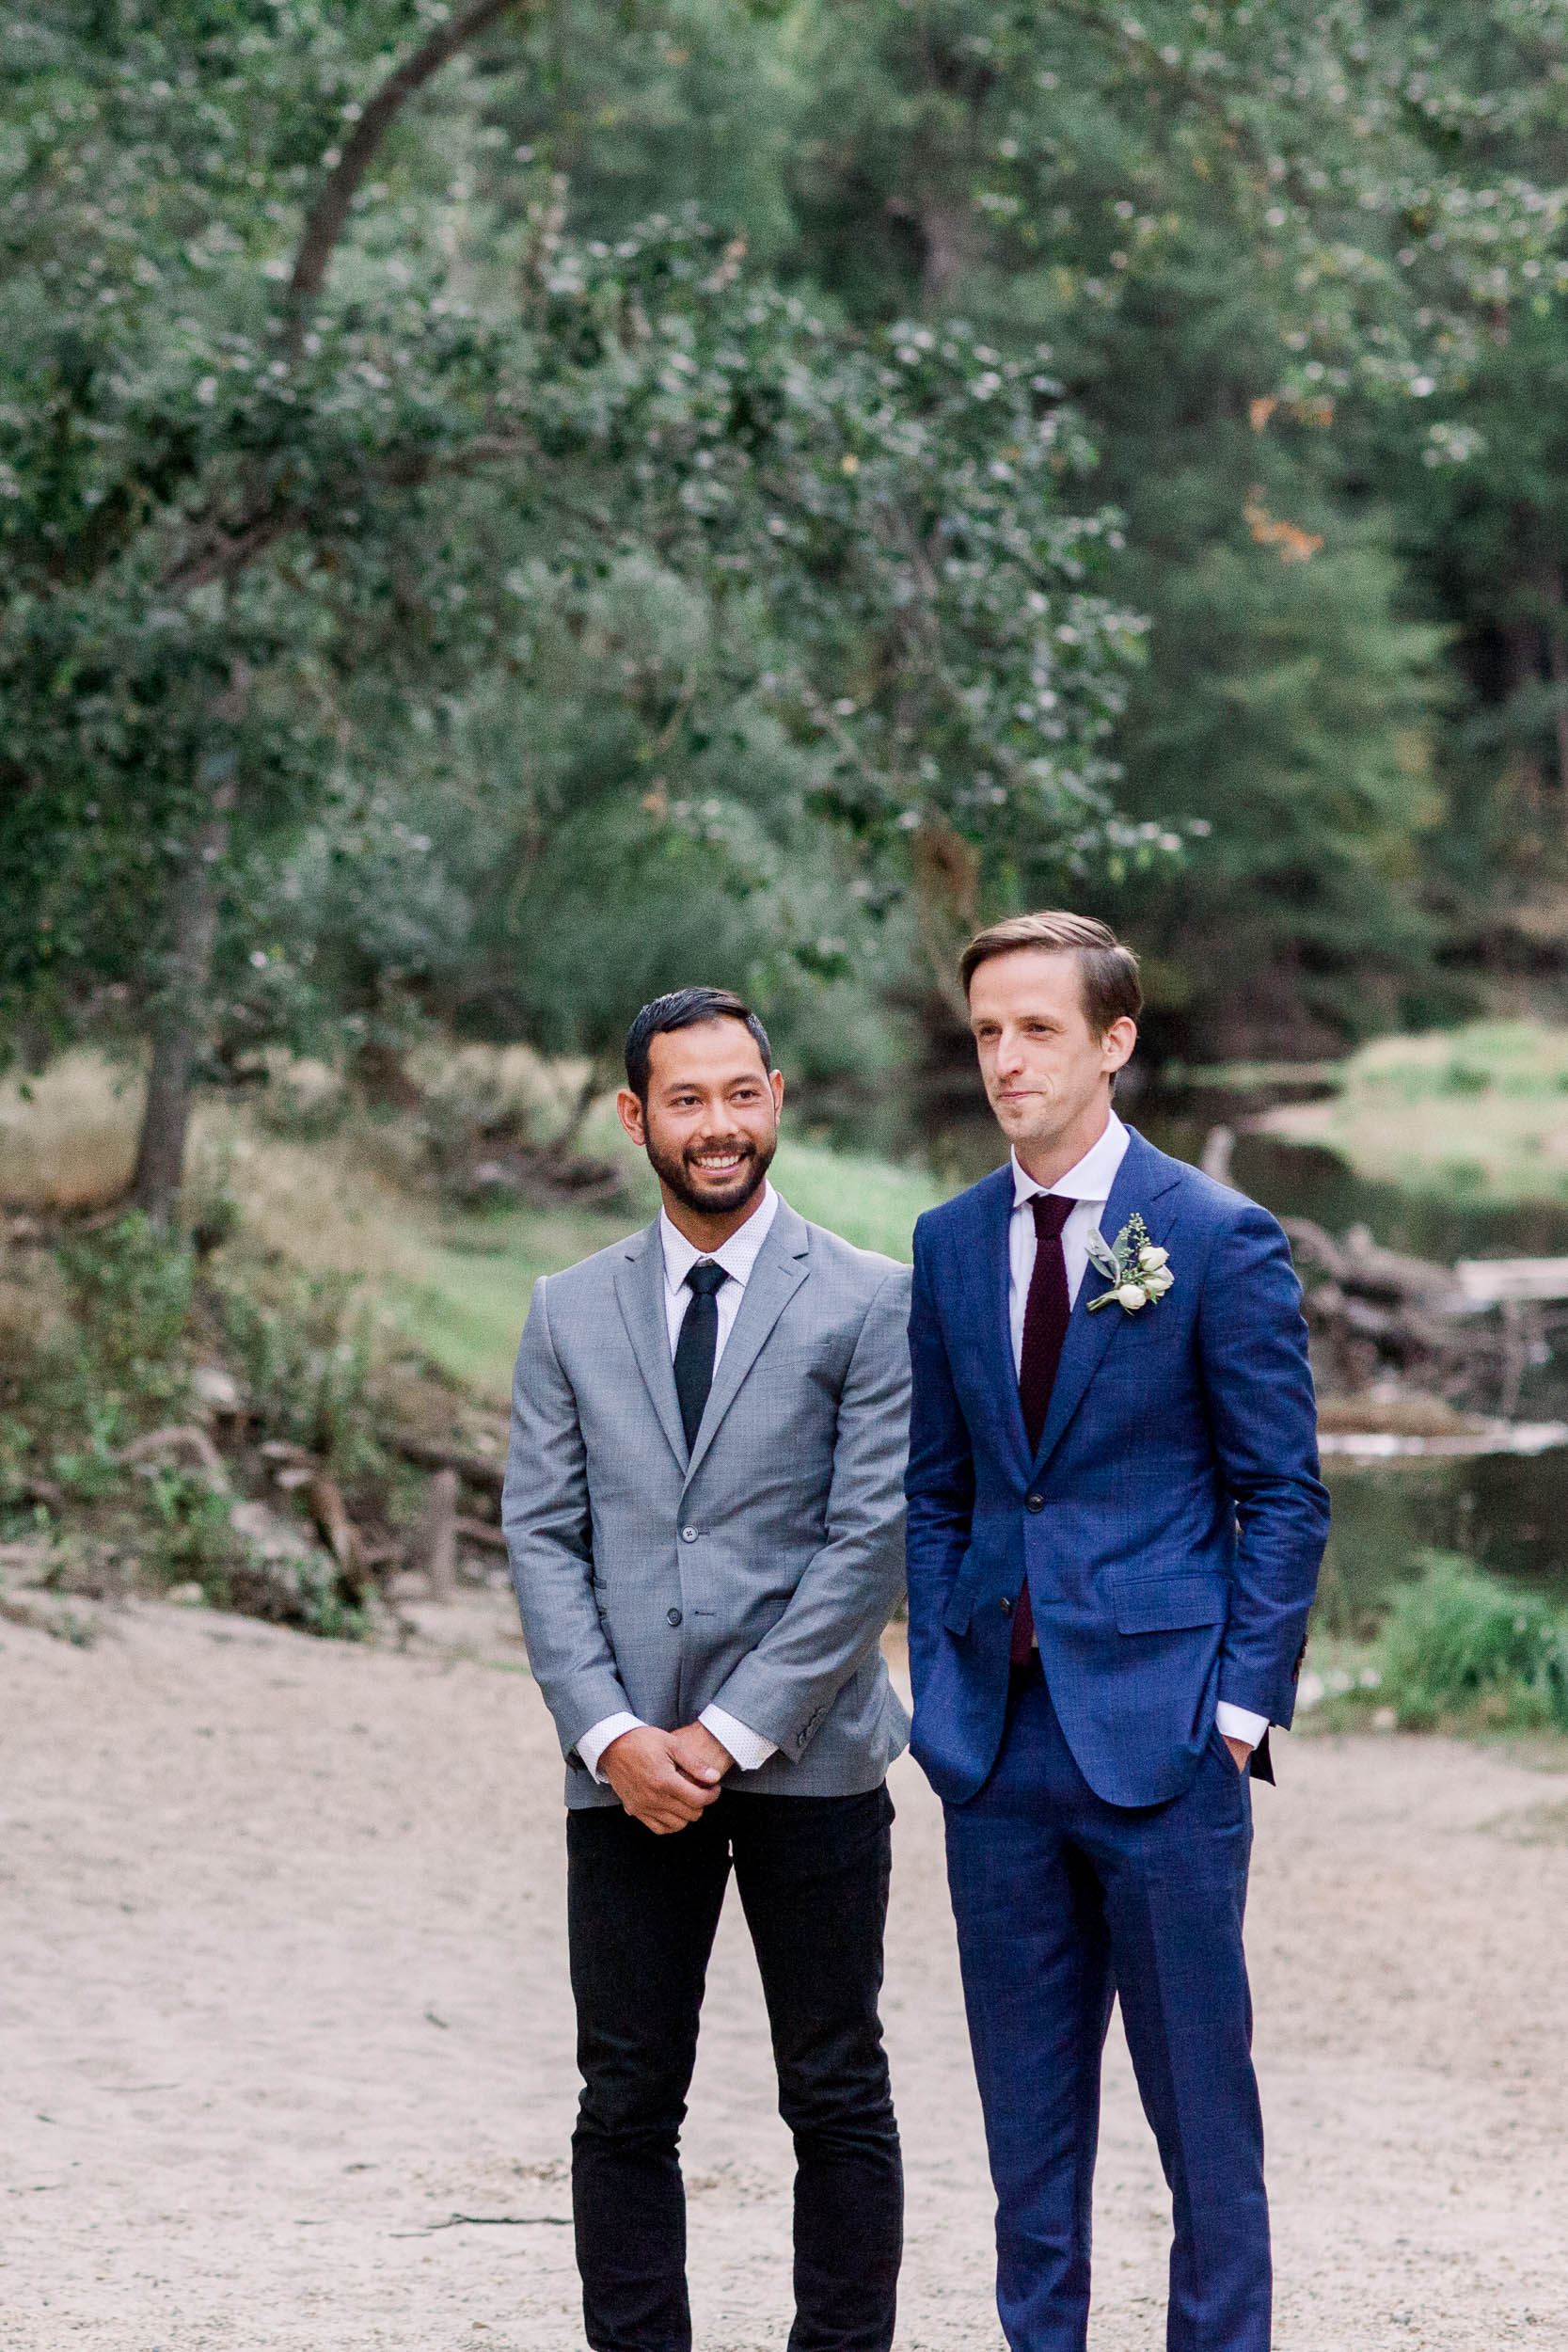 Intimate Yosemite Wedding_Buena Lane Photography_091318ER253-2.jpg